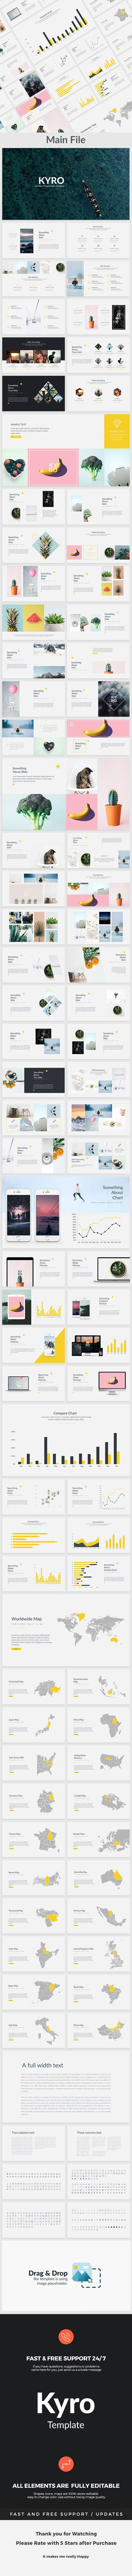 Kyro - Creative Powerpoint Template - 85+ Unique Slides